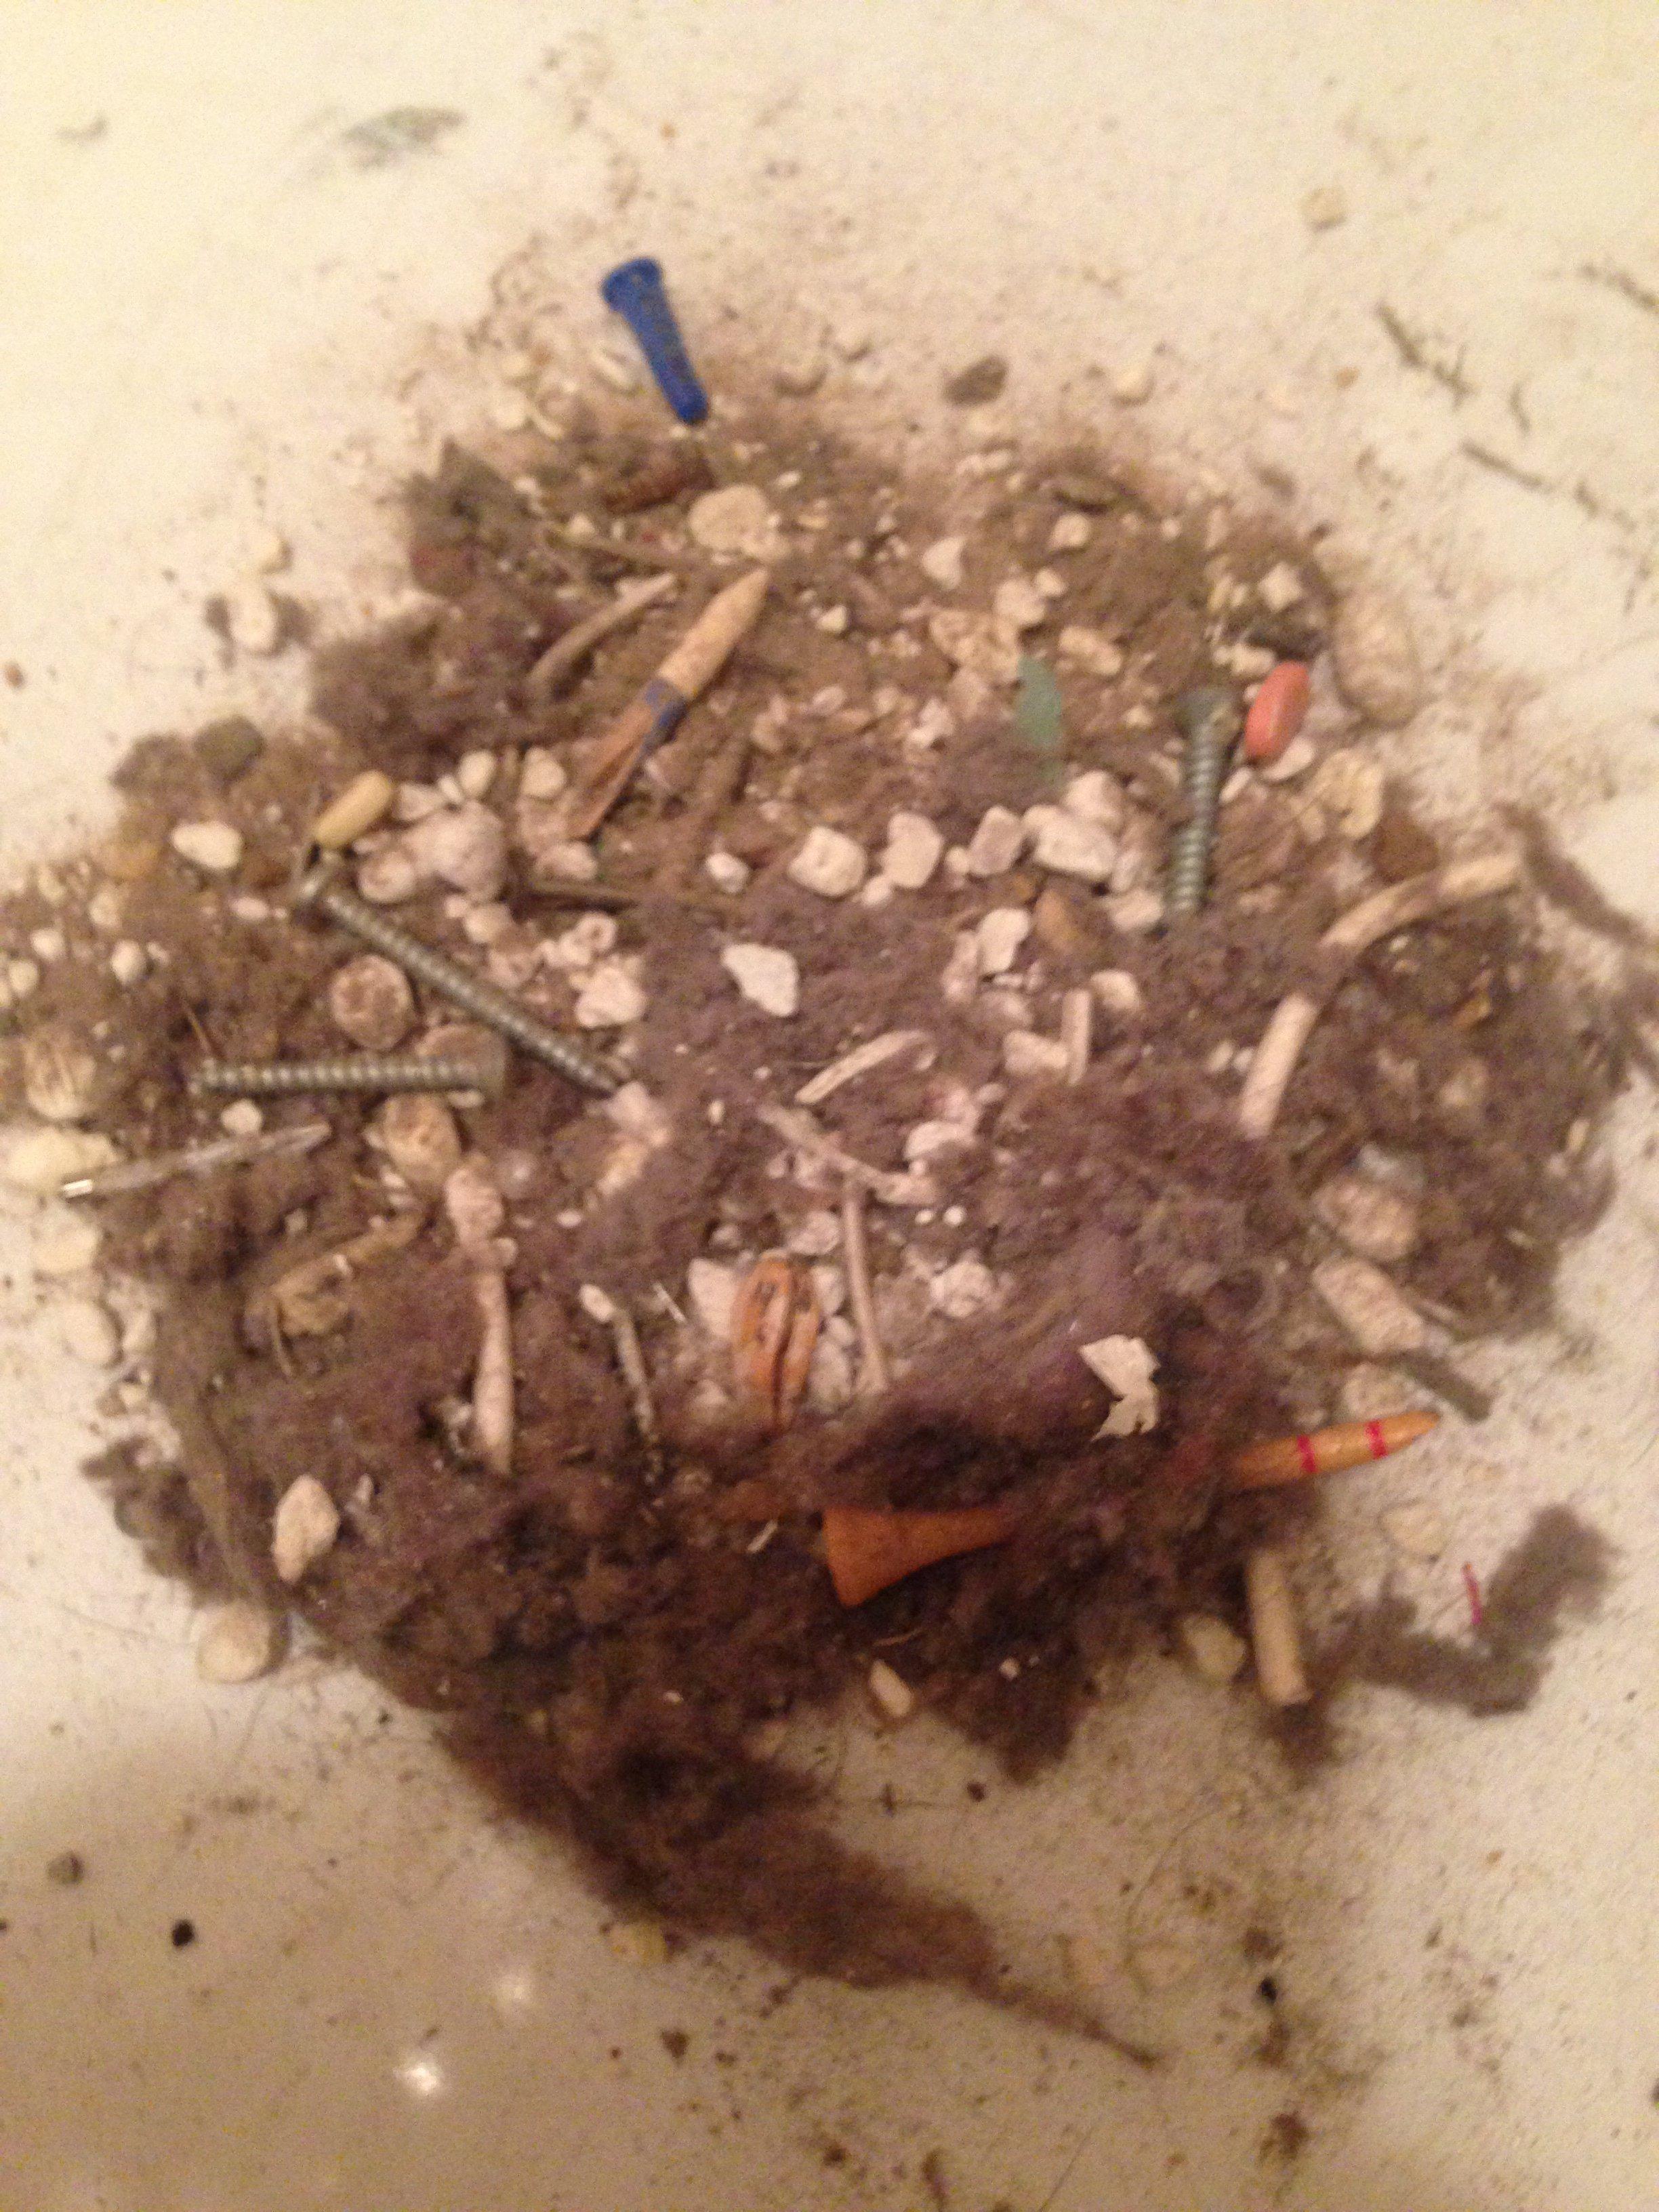 Debris from dryer vent